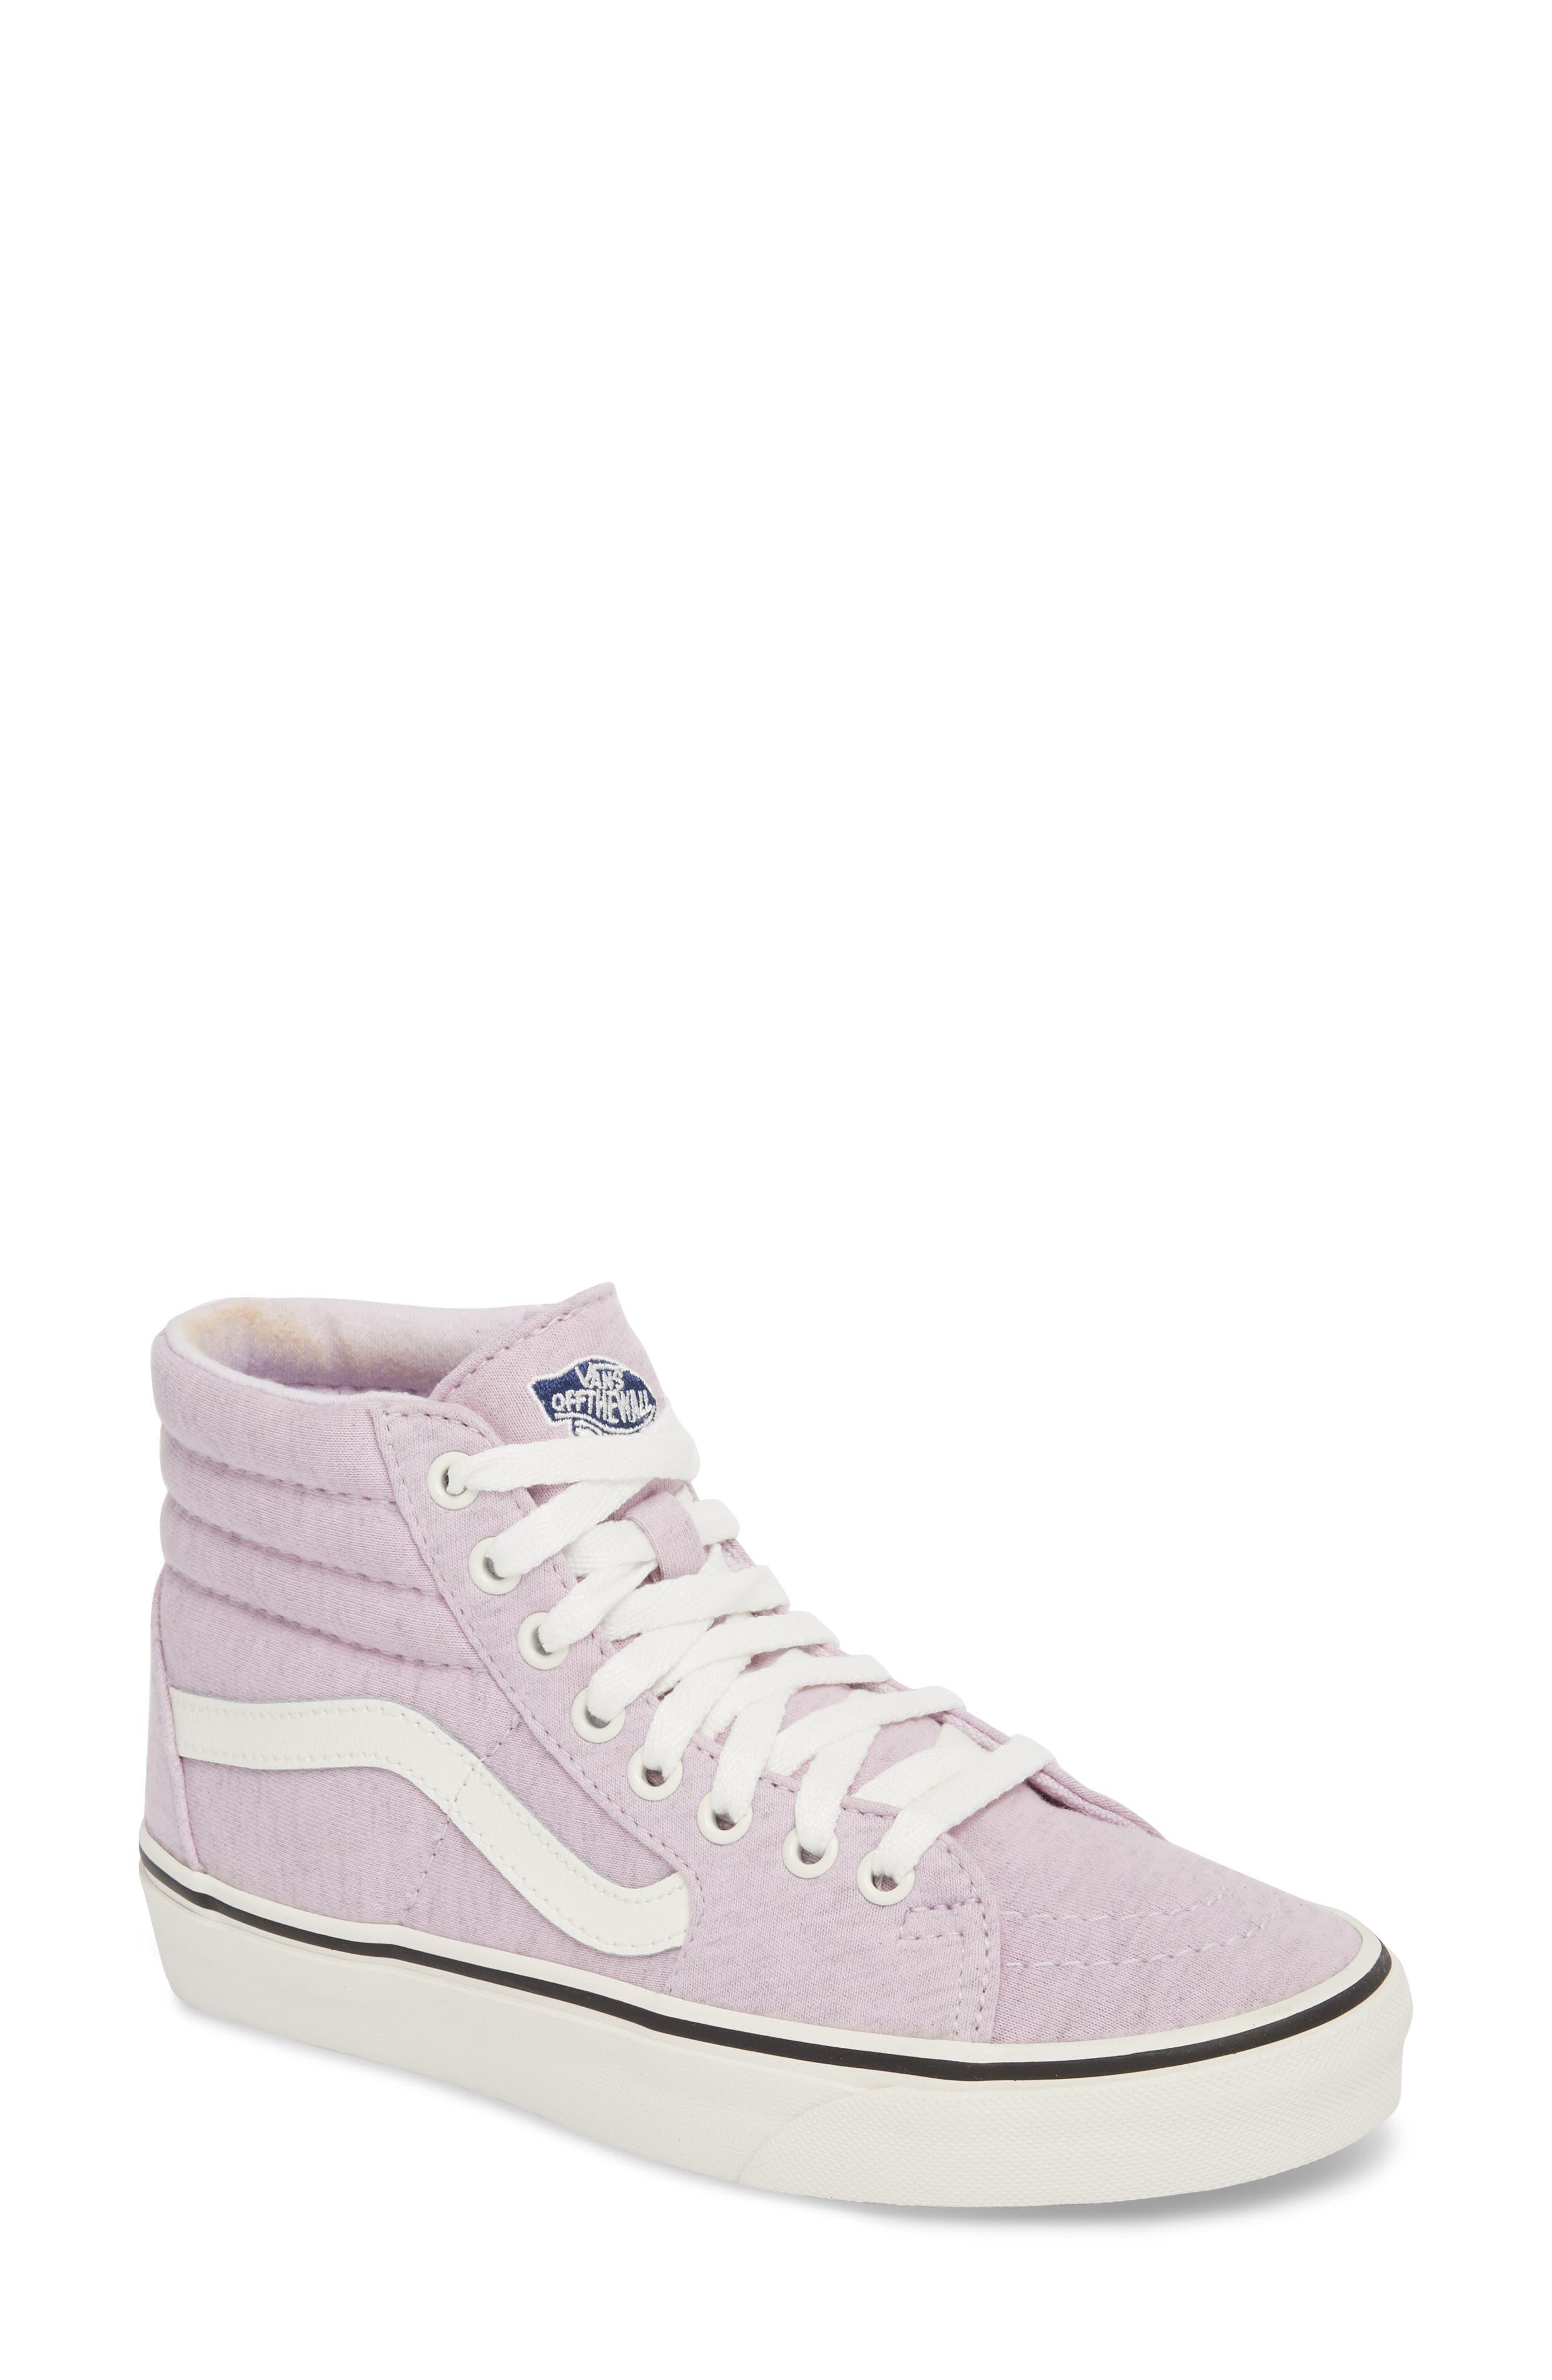 'Sk8-Hi' Sneaker,                             Main thumbnail 1, color,                             Lavender Fog/ Snow White